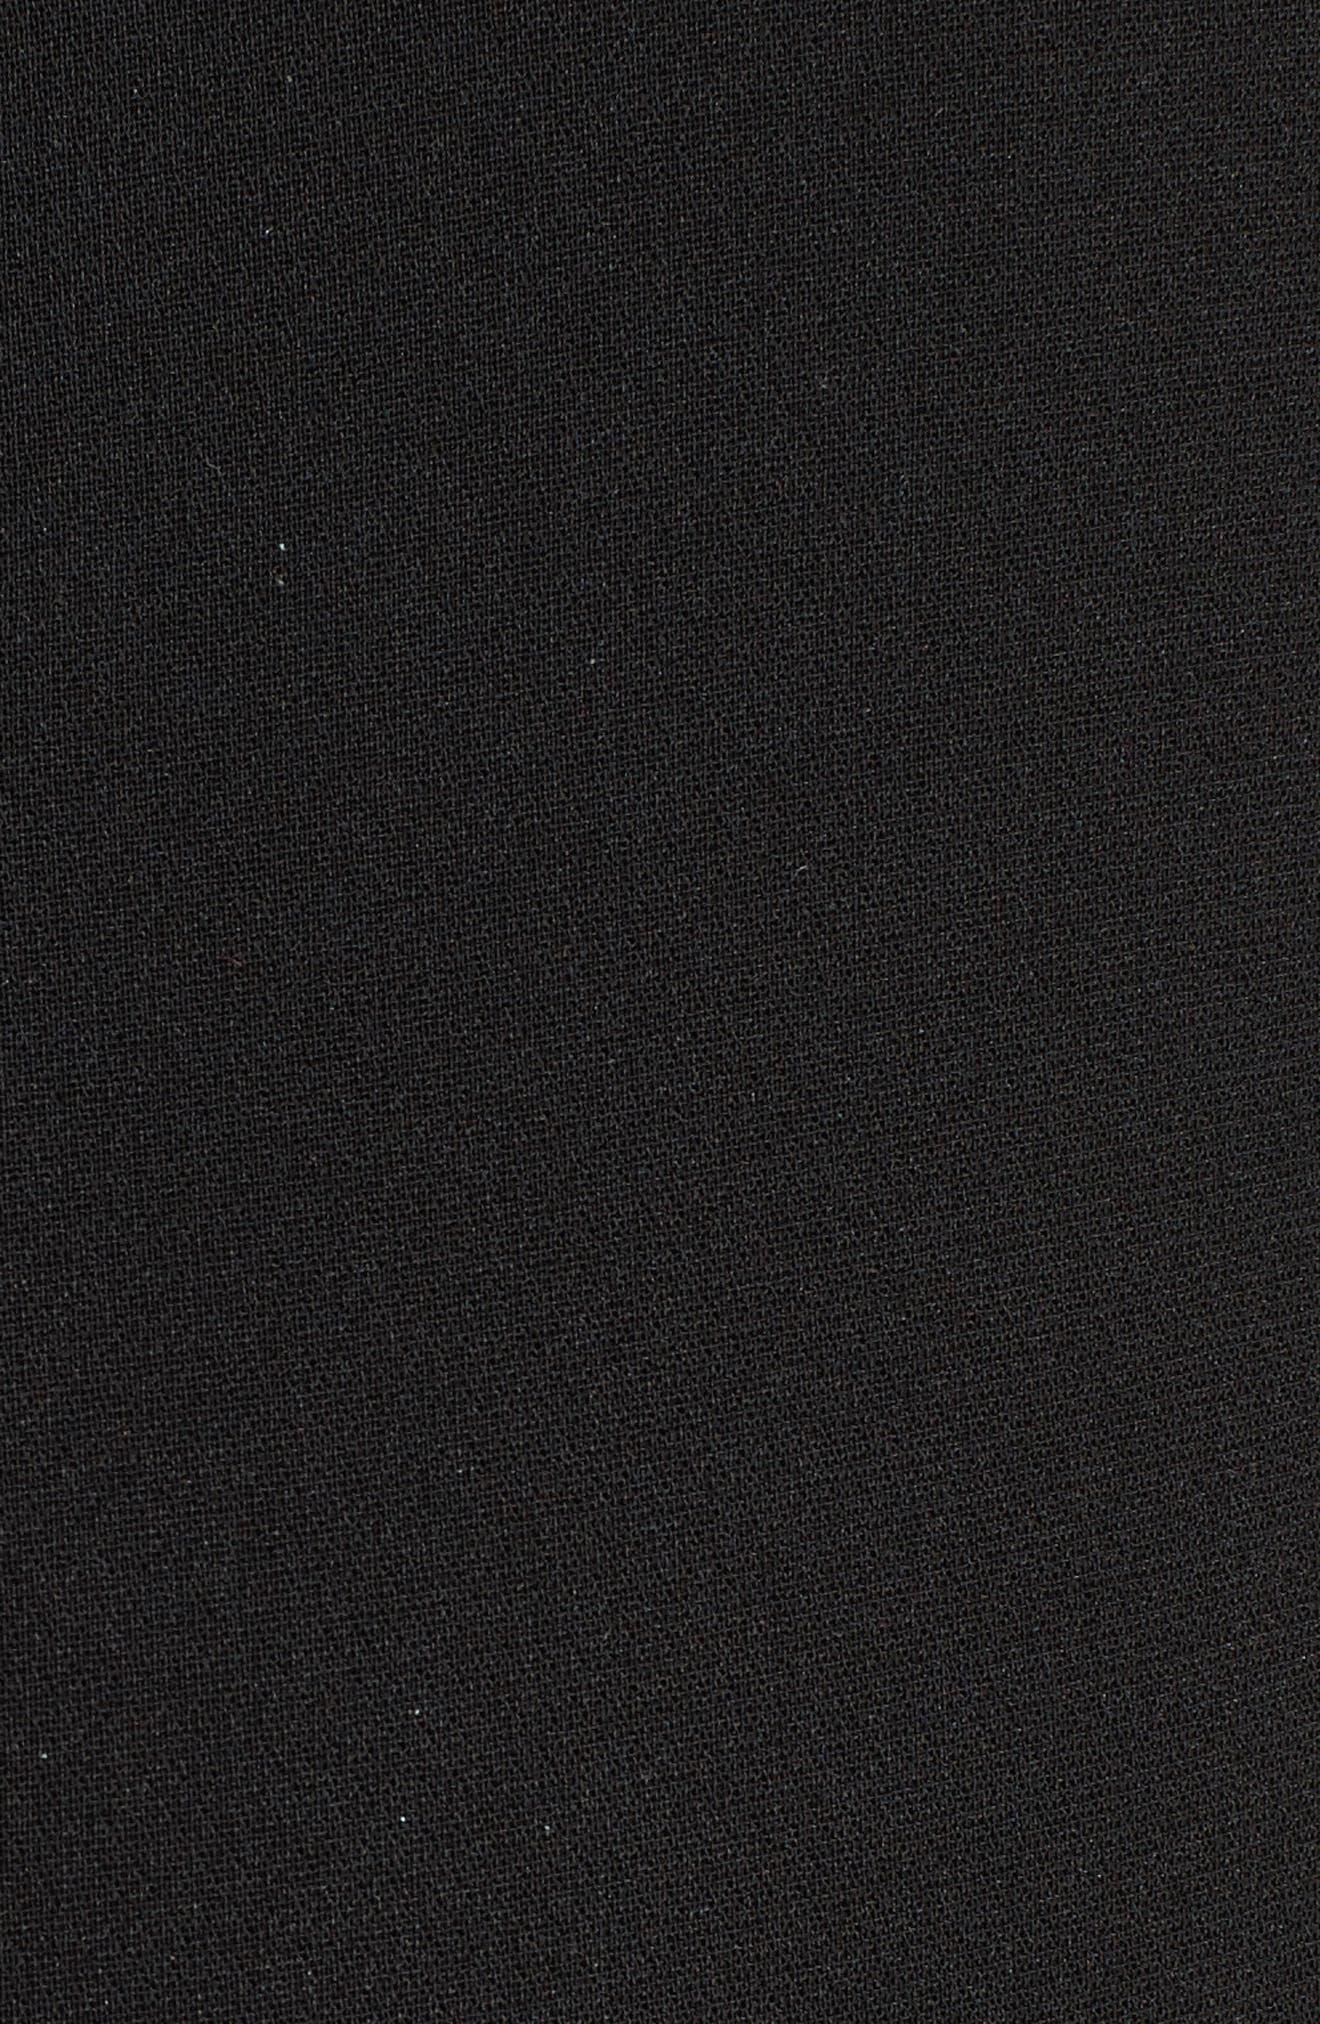 Tash Tassel Crepe Pants,                             Alternate thumbnail 6, color,                             Black